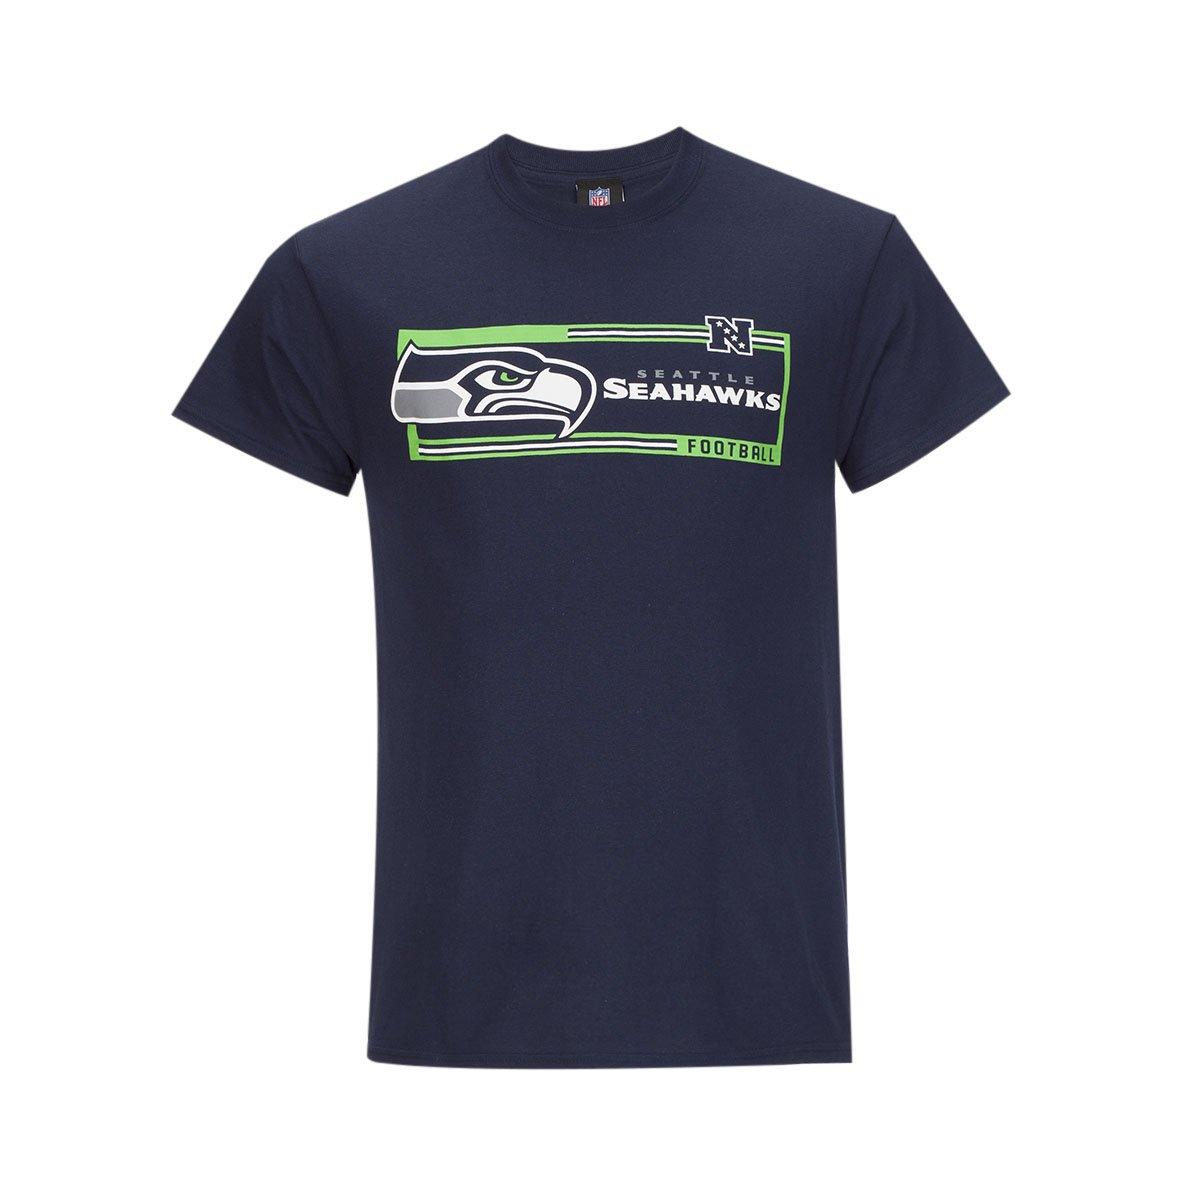 Playera Seattle Seahawks Nfl- Caballero  d09a1466a4c